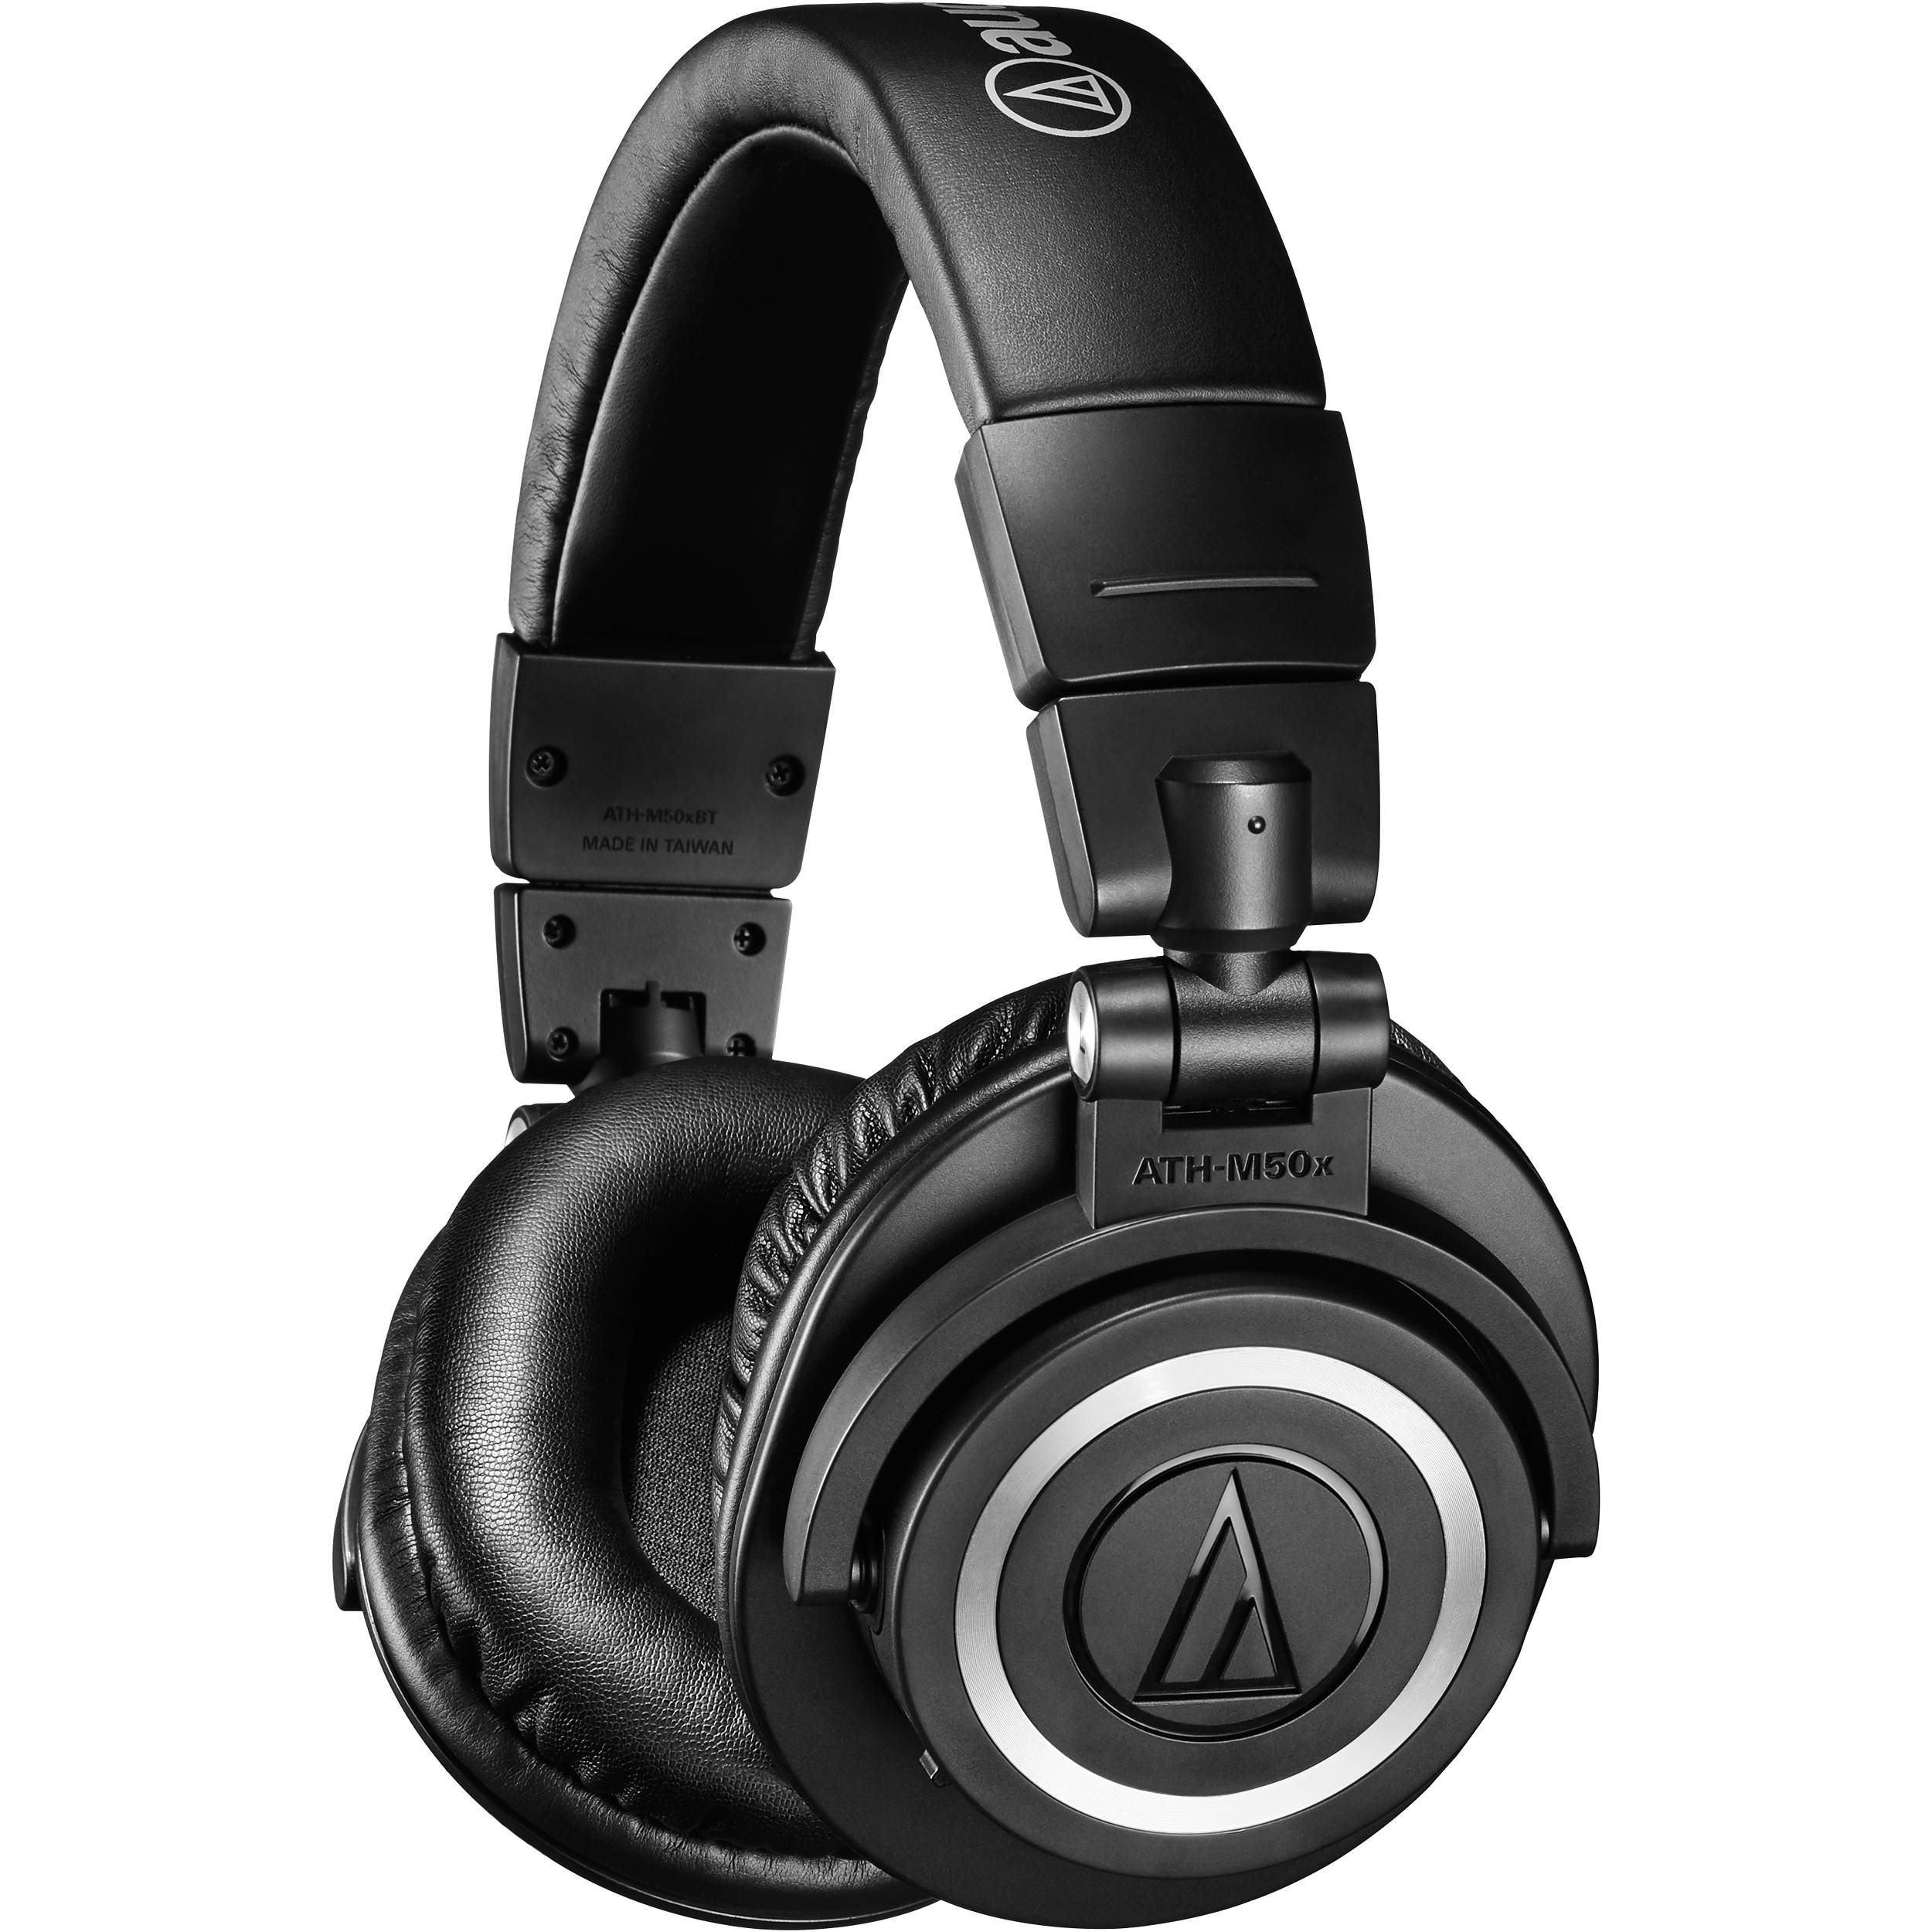 9cecea35591 Audio-Technica Consumer ATH-M50xBT Wireless Over-Ear ATH-M50XBT